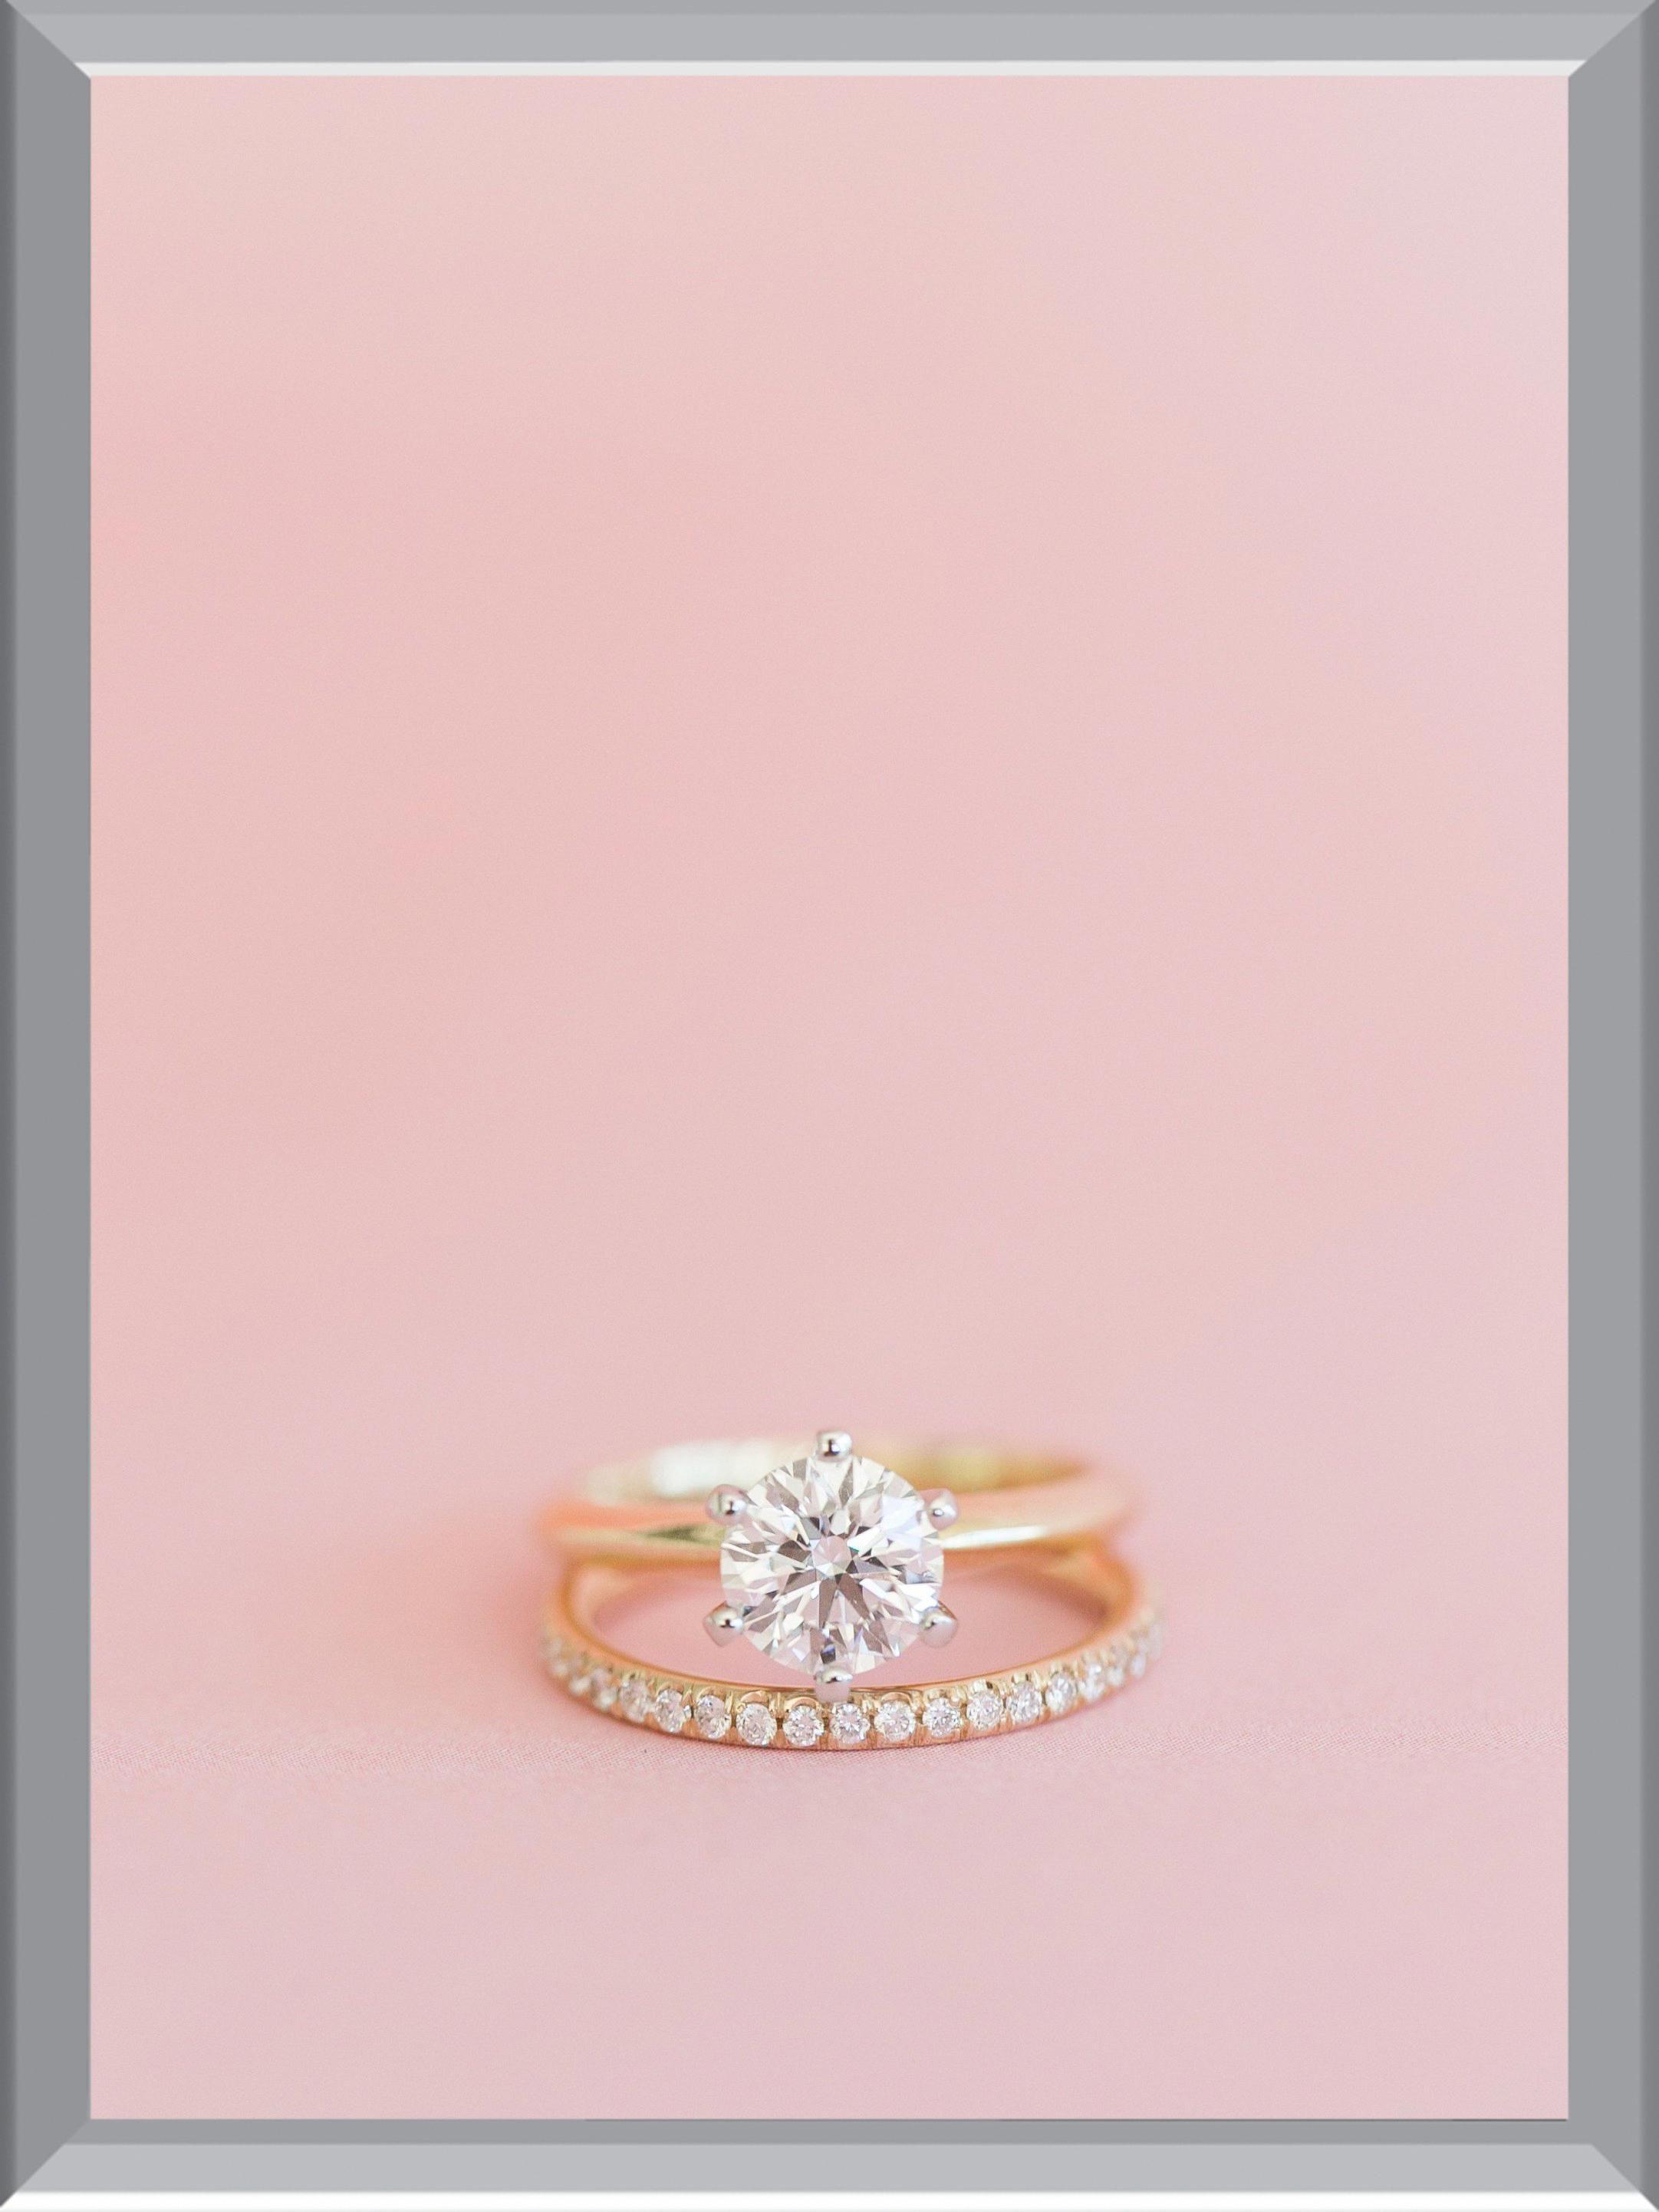 Sensational Simple Wedding Rings .. | Engagement Rings & Wedding ...